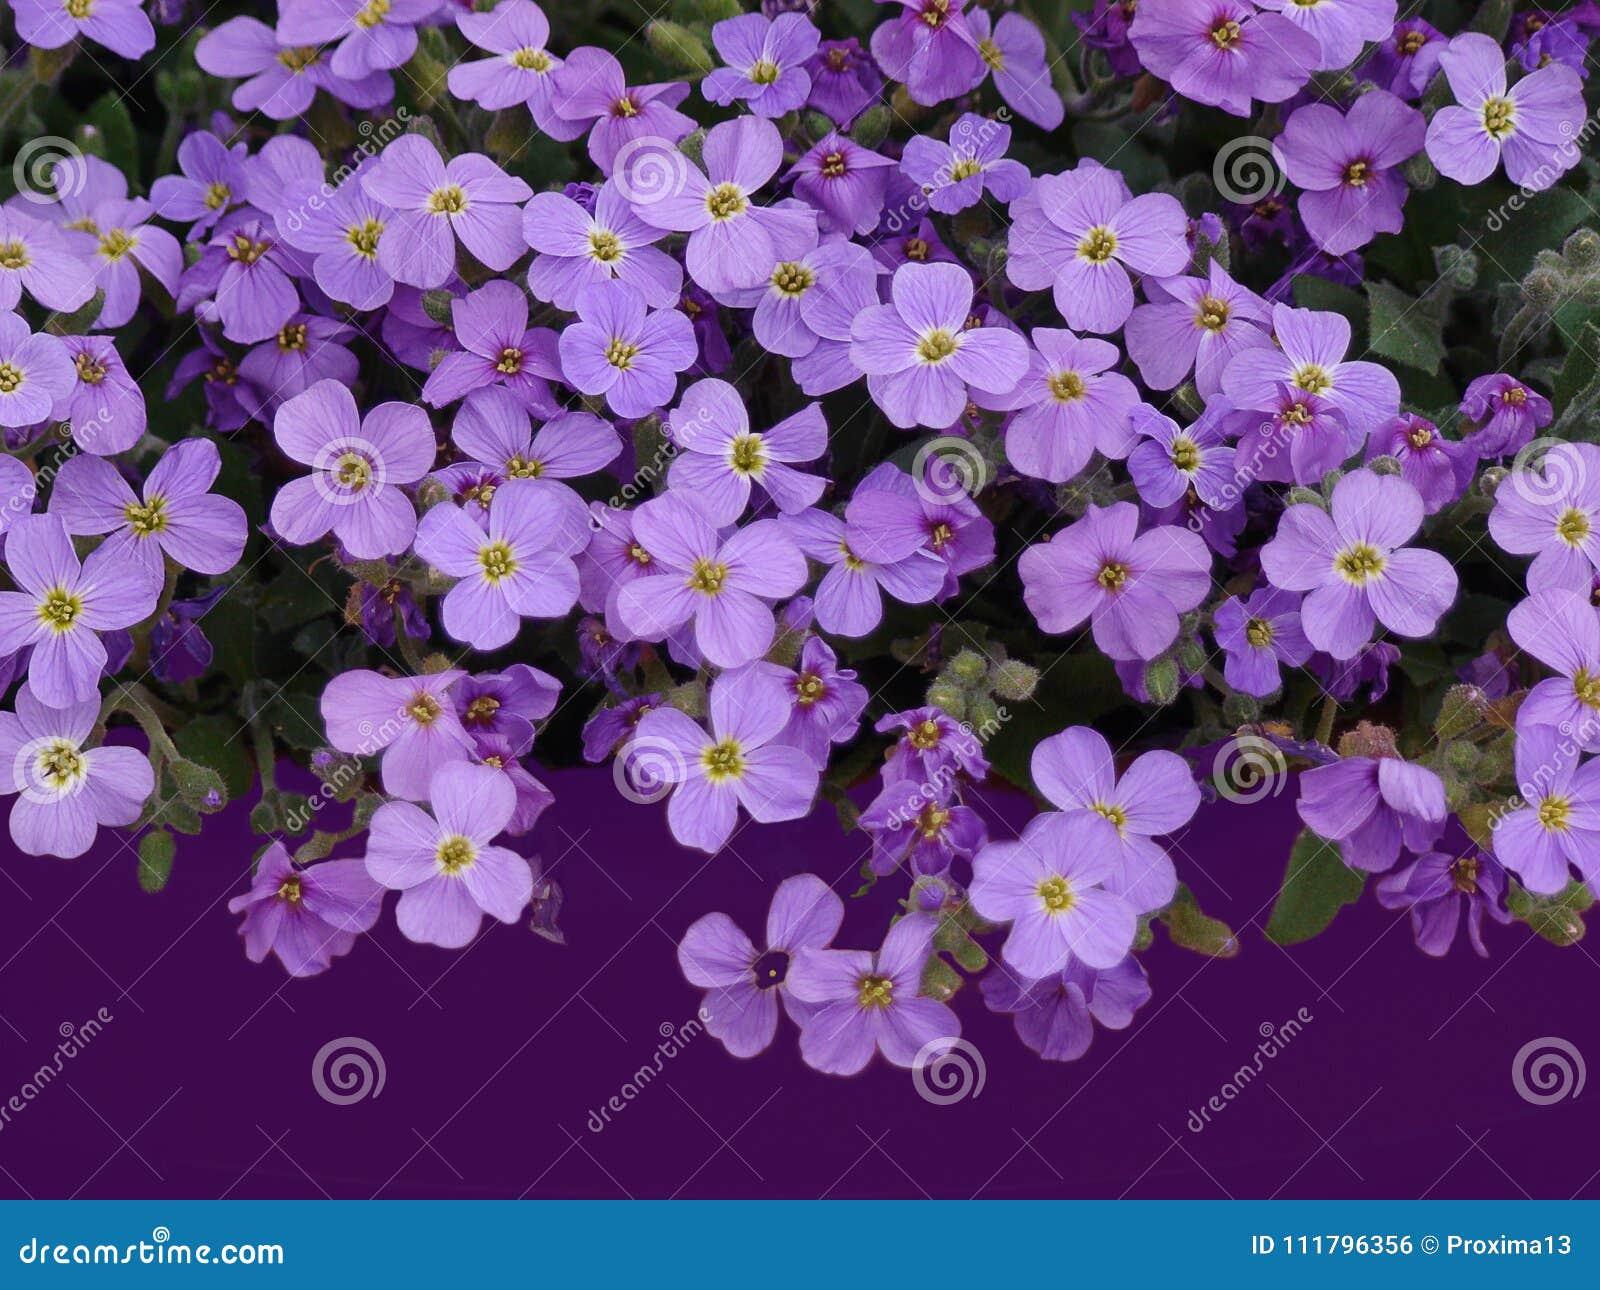 Mass Of Purple Flowers Of Lobelia On A Dark Purple Background Free